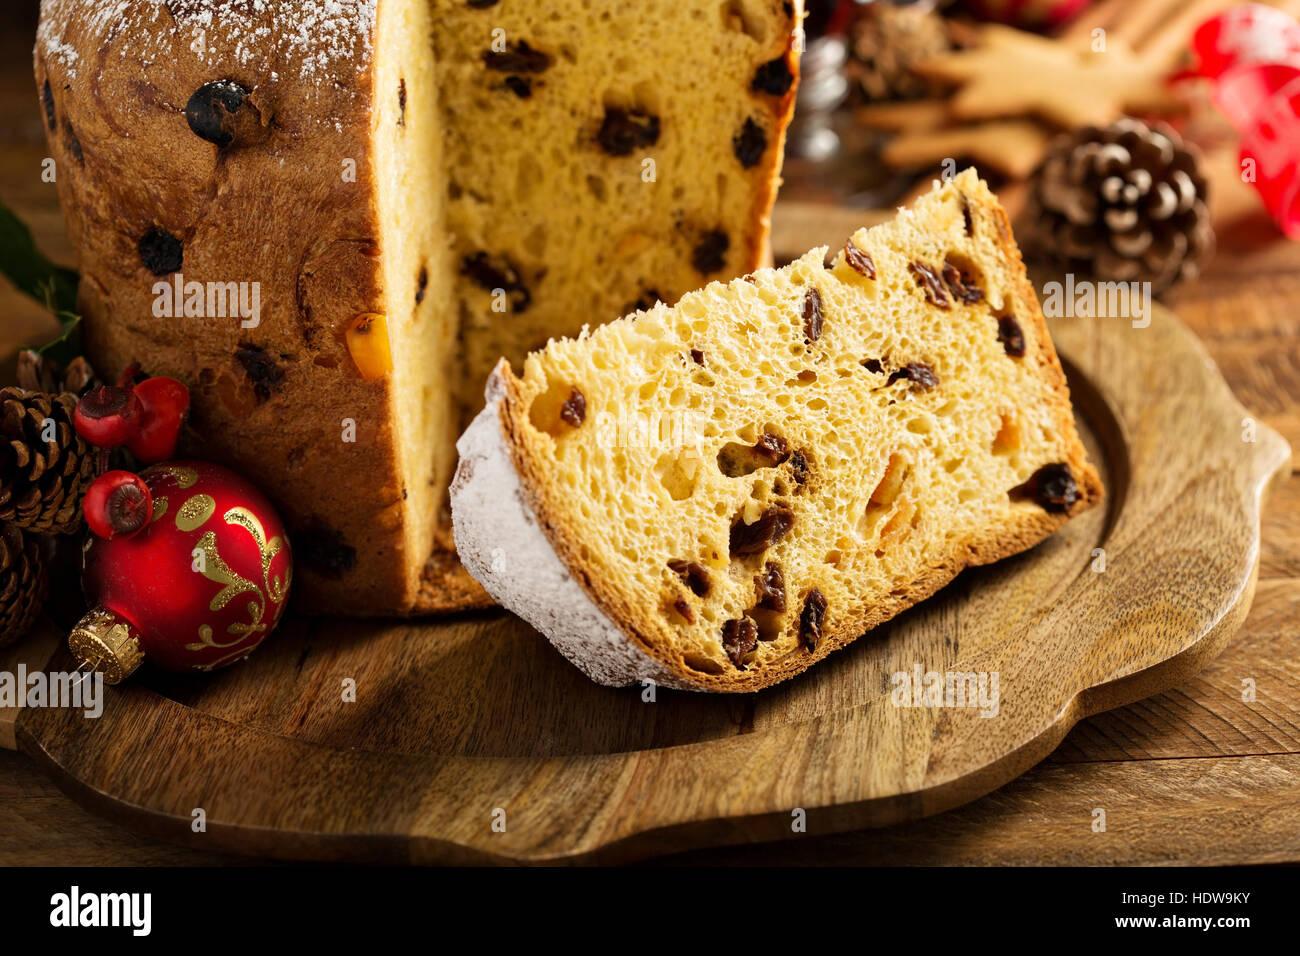 Navidad tradicional panettone con frutas secas Imagen De Stock